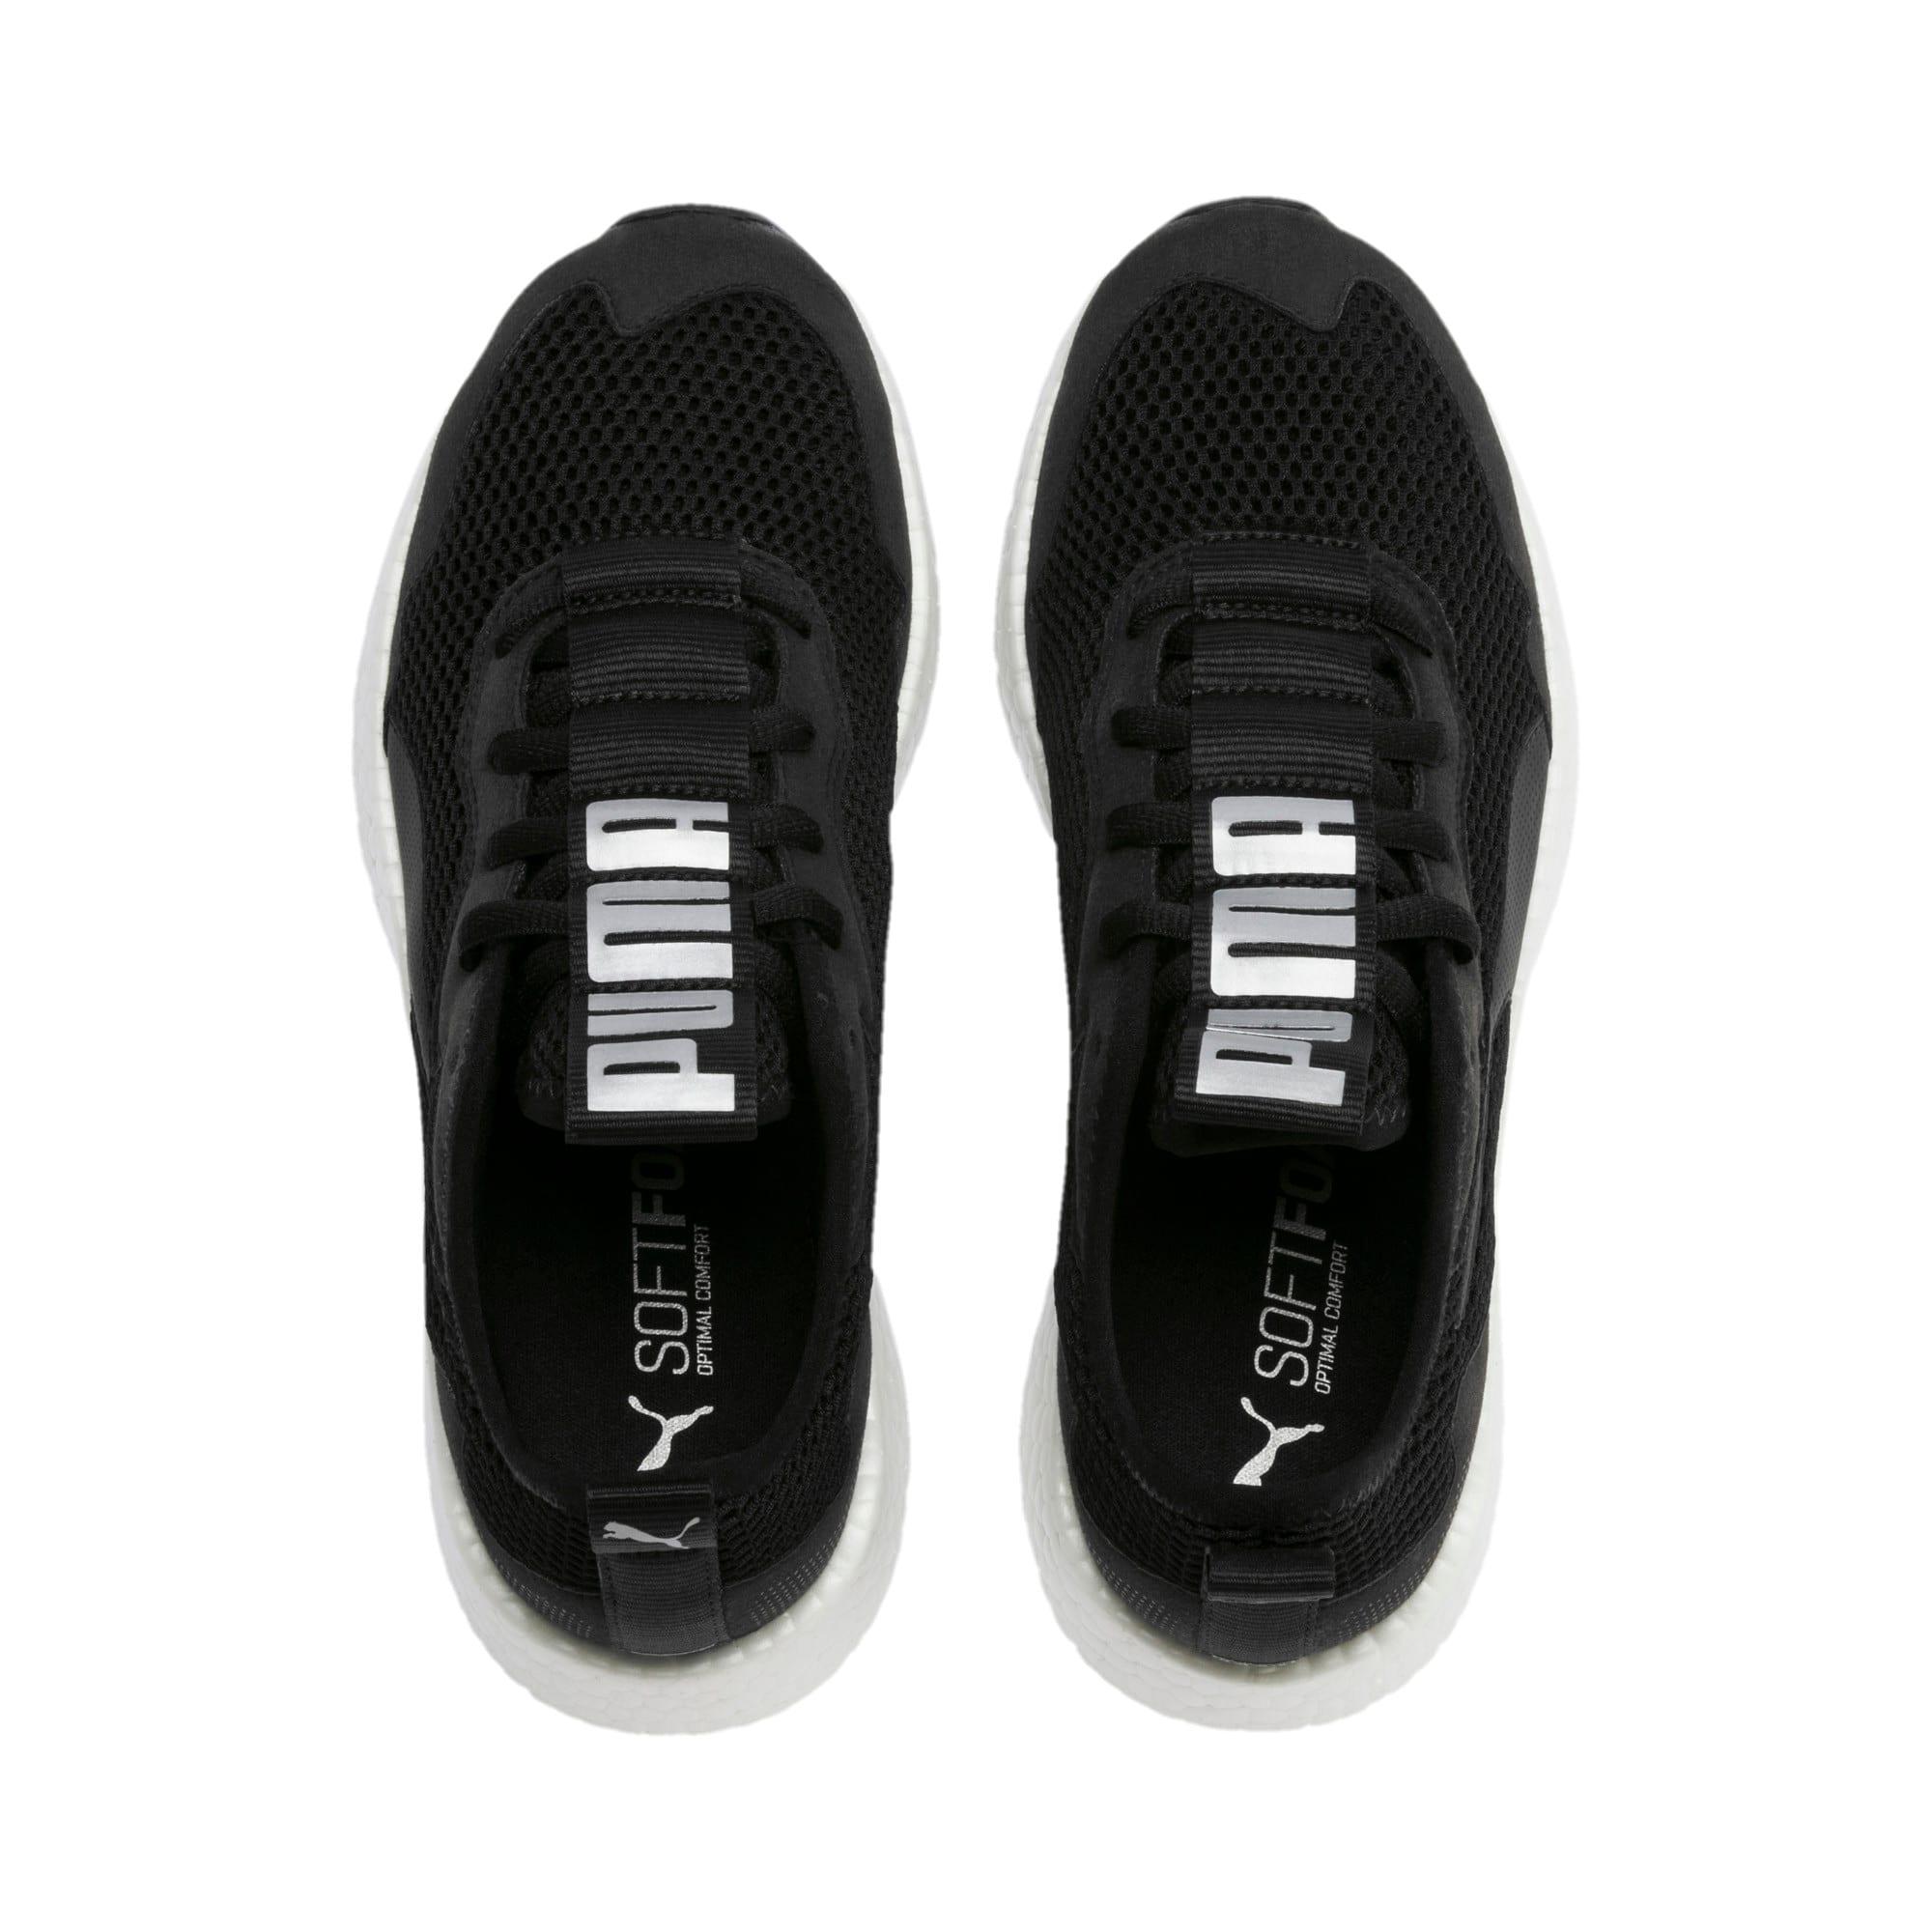 Thumbnail 7 of NRGY Neko Skim Women's Running Shoes, Puma Black-Puma Silver, medium